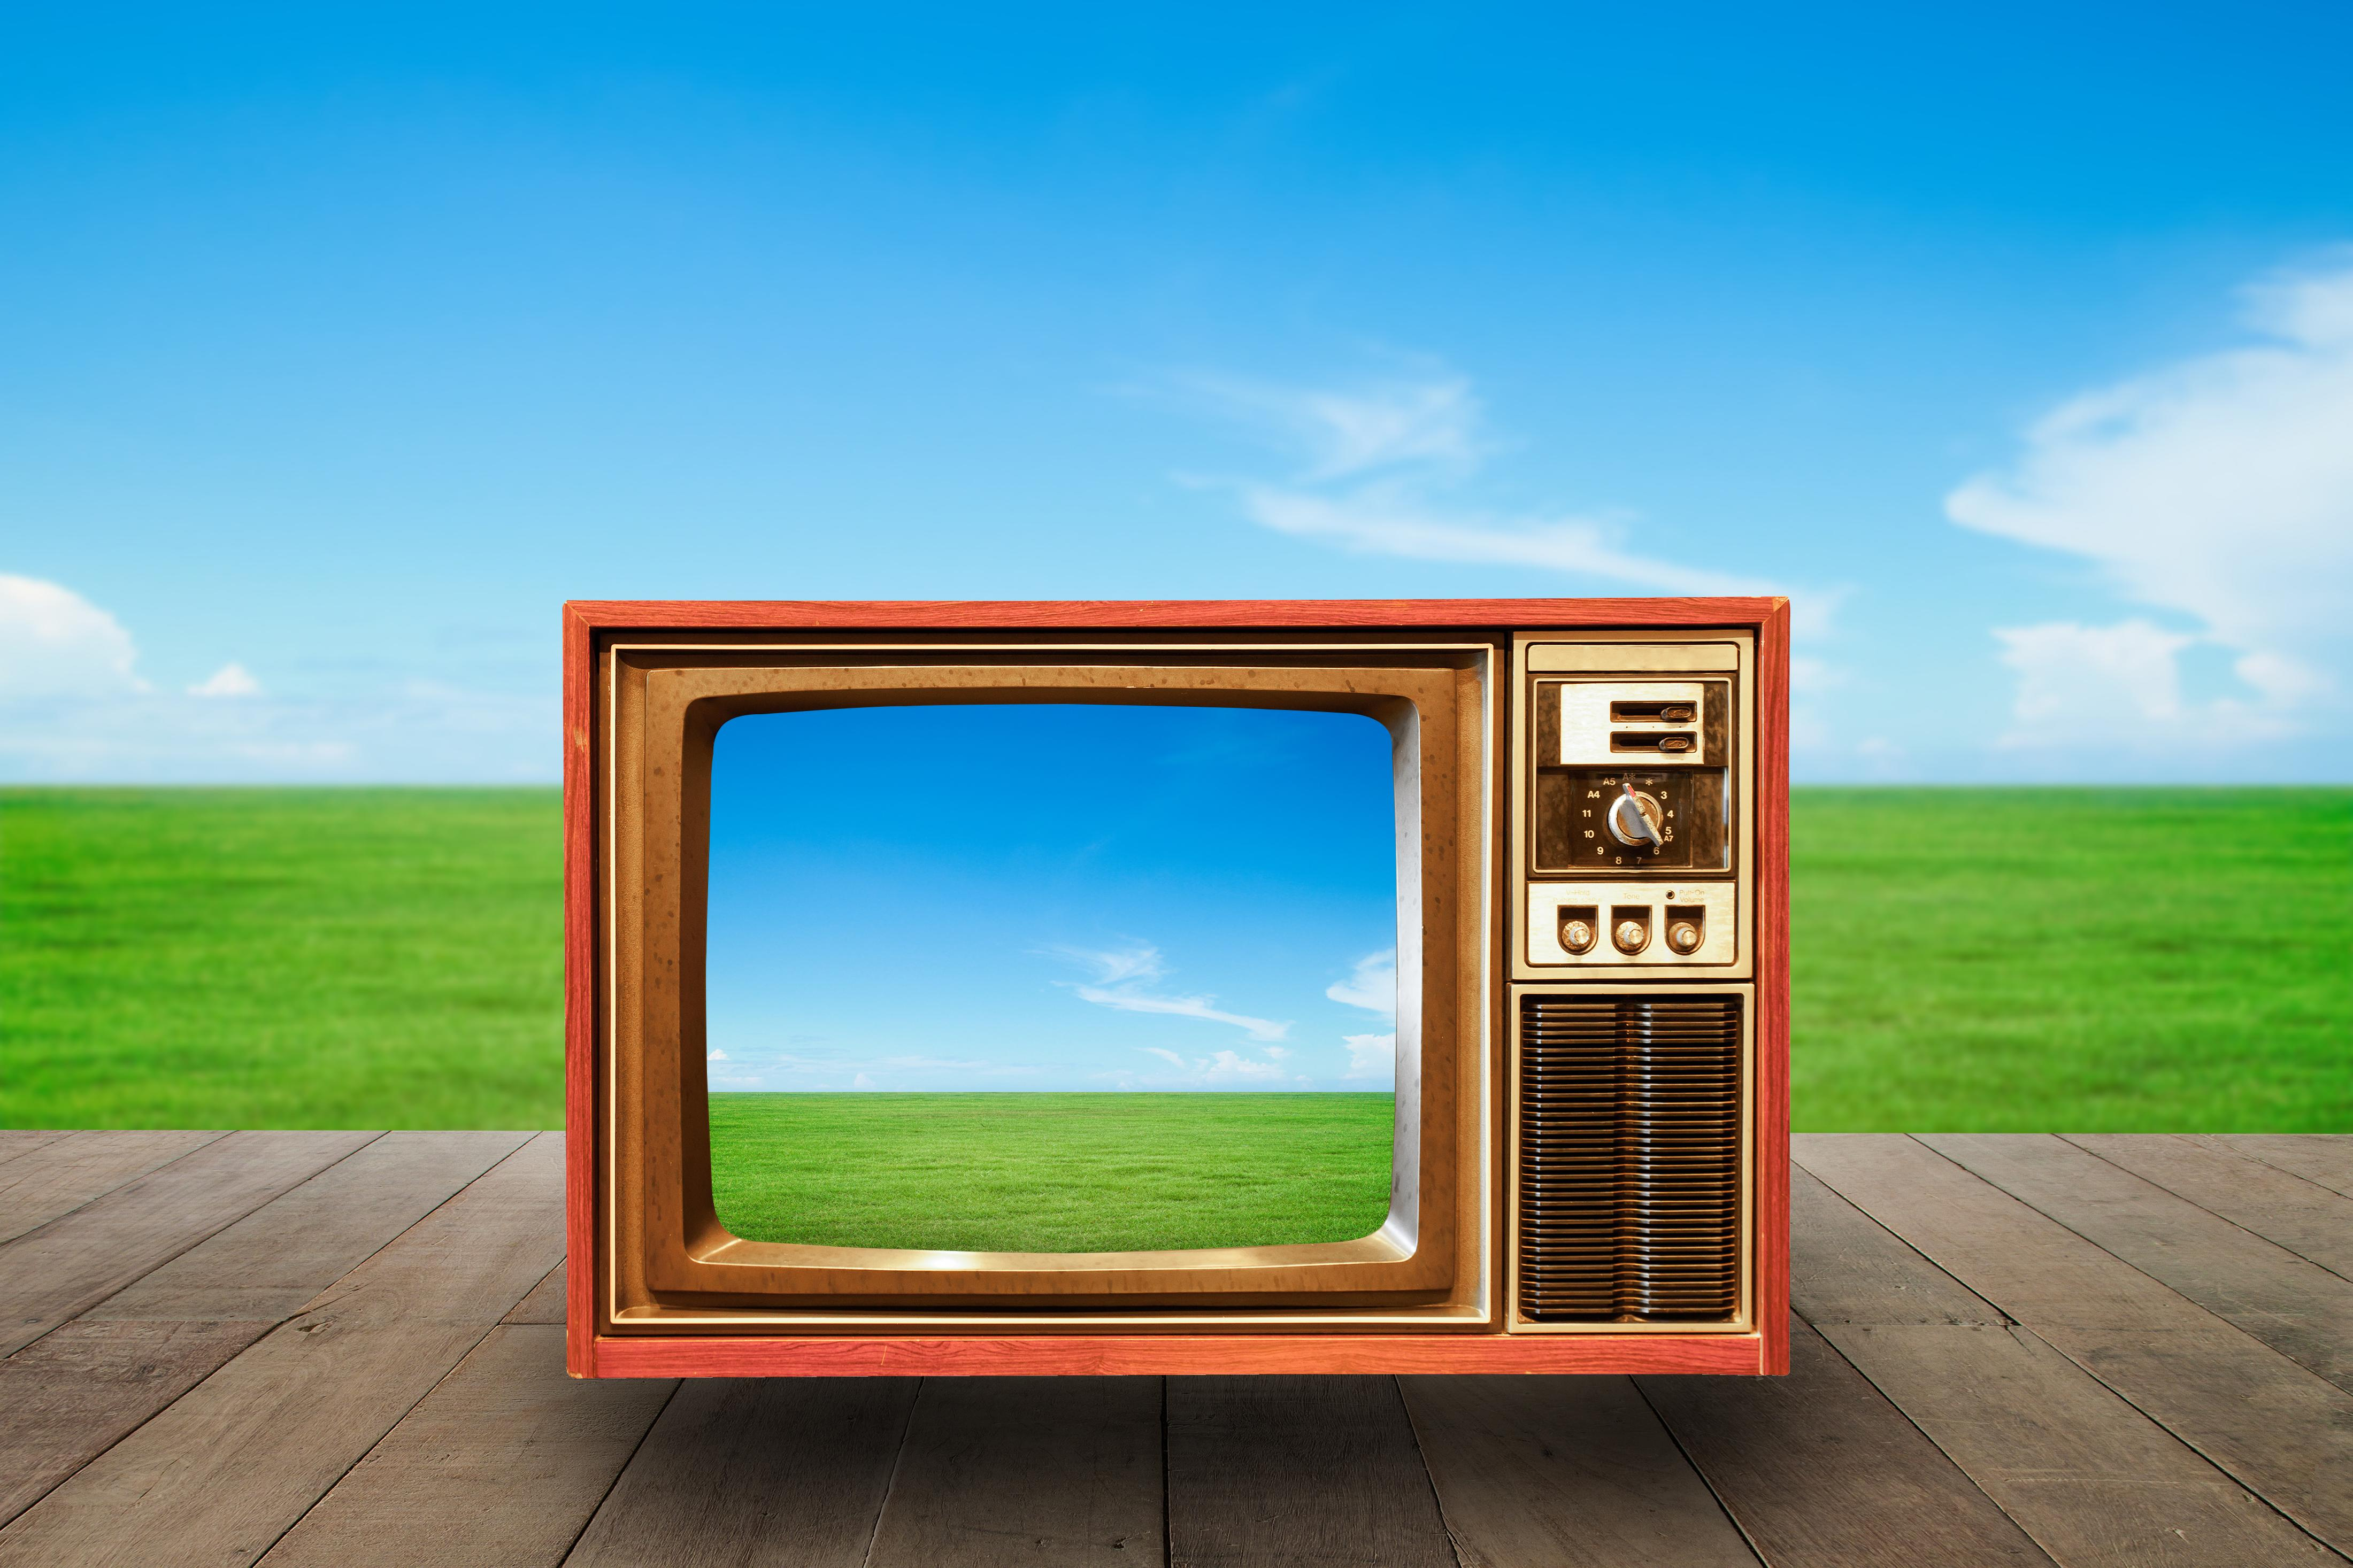 Serie B Streaming Simulcast